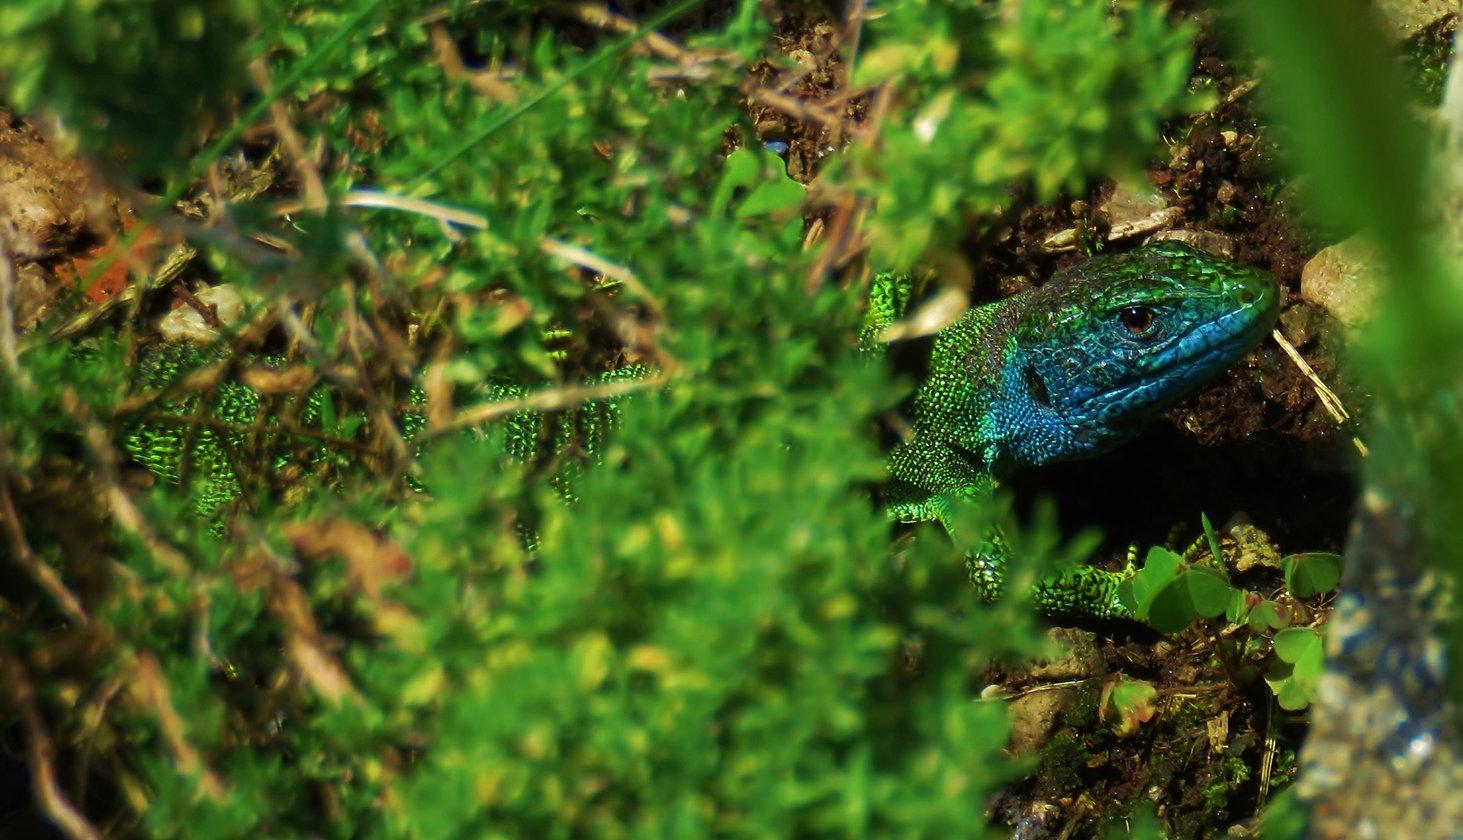 Western green lizard (lacerta bilineata) adult male, Monteggio, June 2016